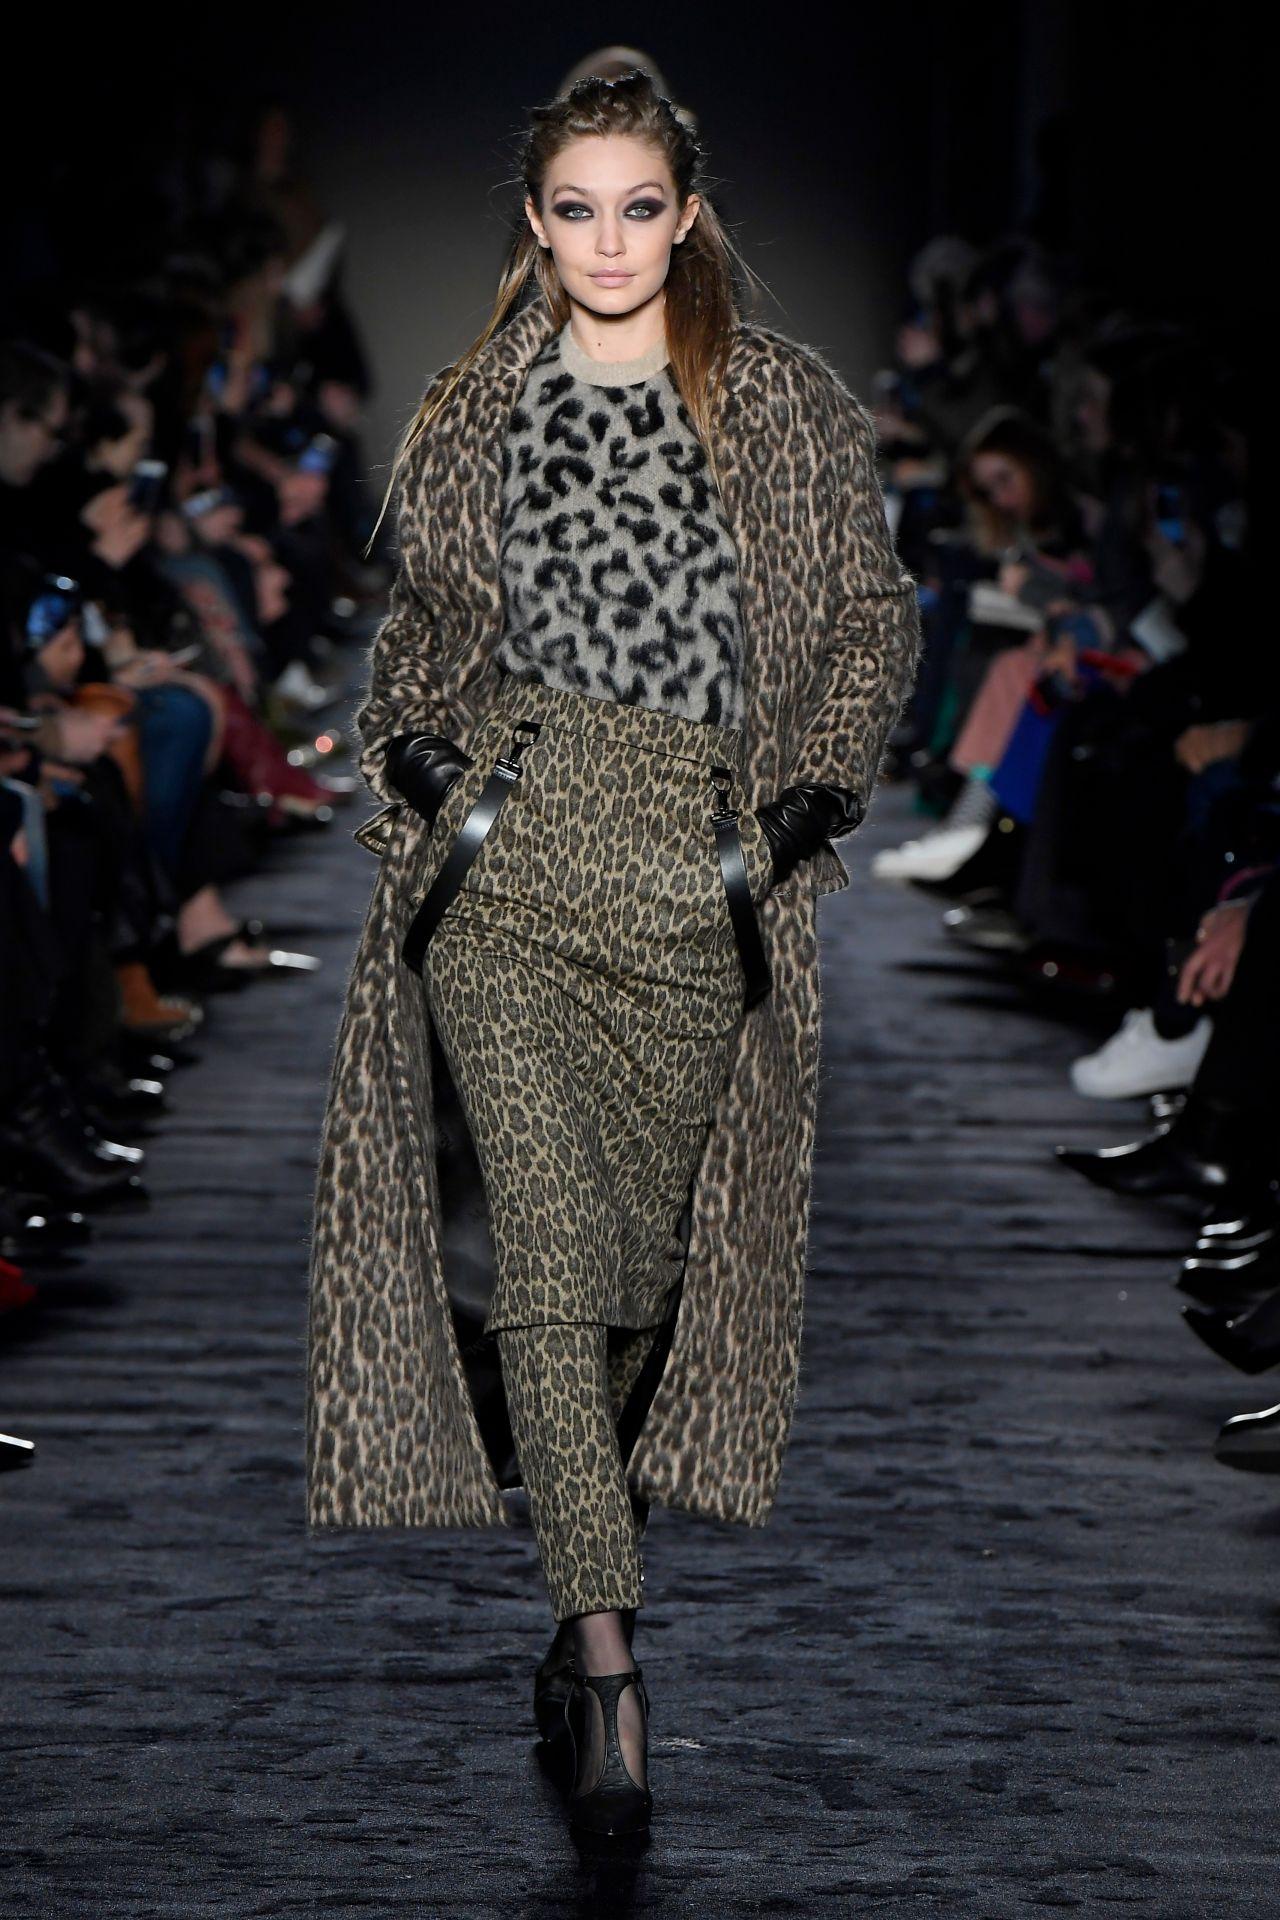 Gigi hadid supermodel runway walk at milan fashion week fendi show